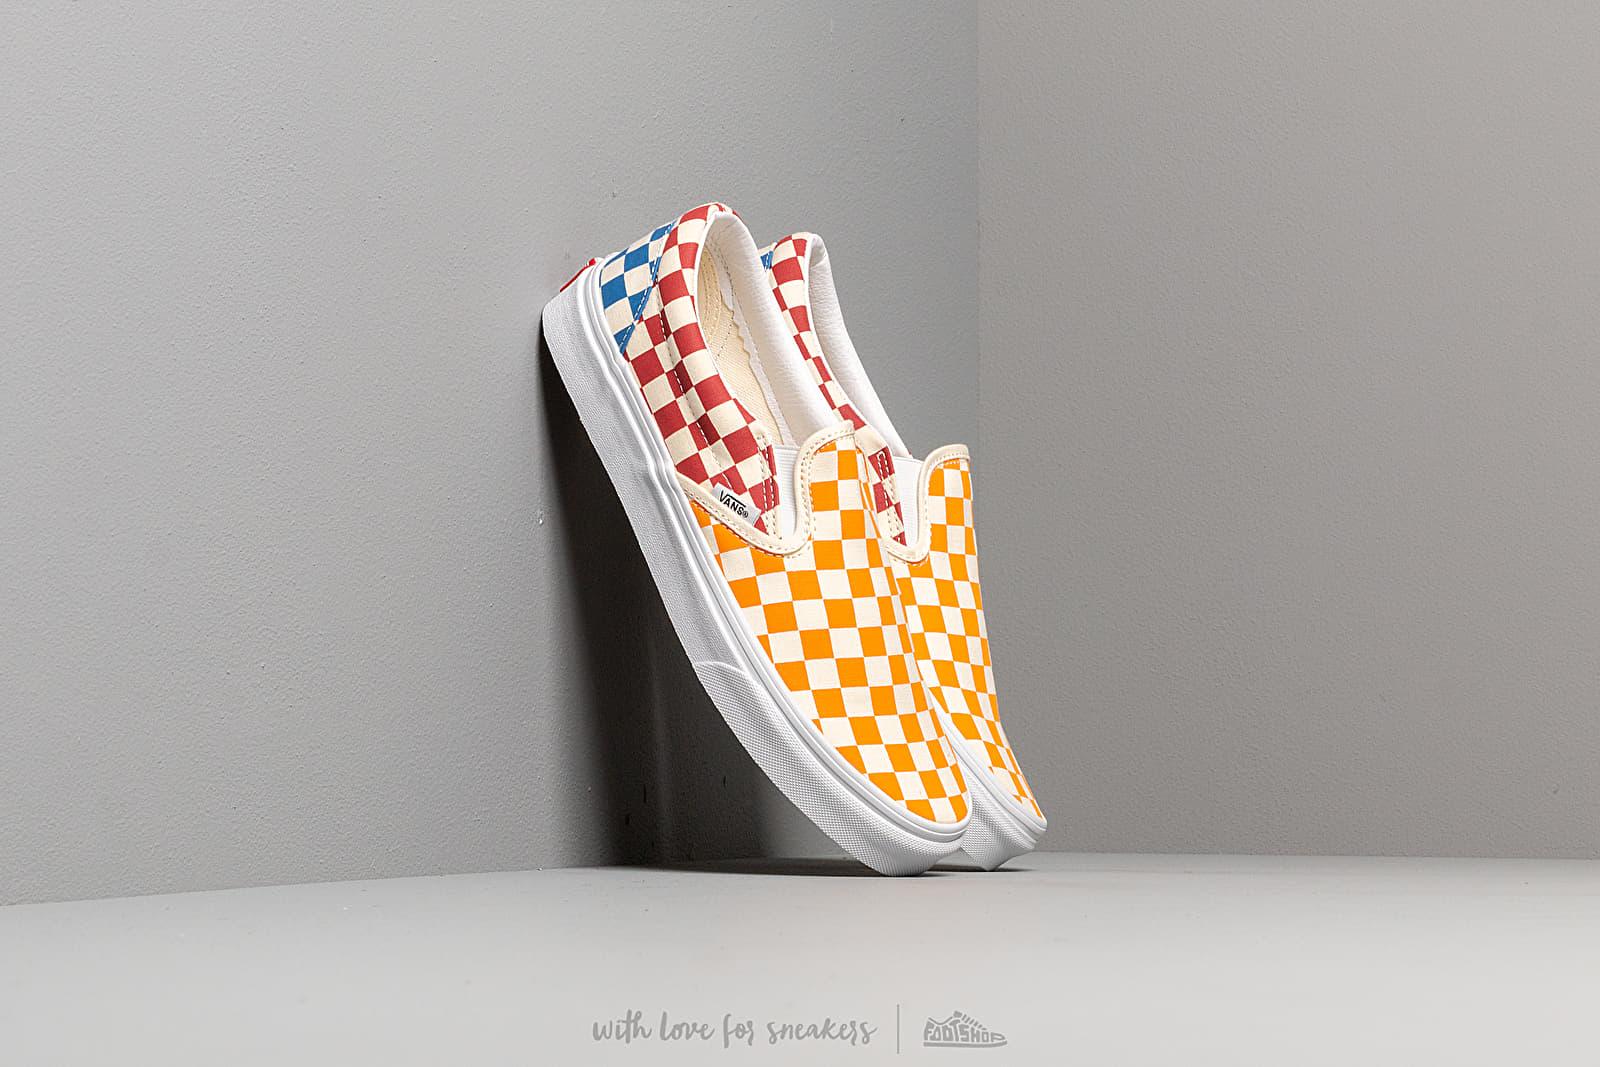 Vans Classic Slip-On (Checkerboardard) Multi/ True White za skvelú cenu 59 € kúpite na Footshop.sk